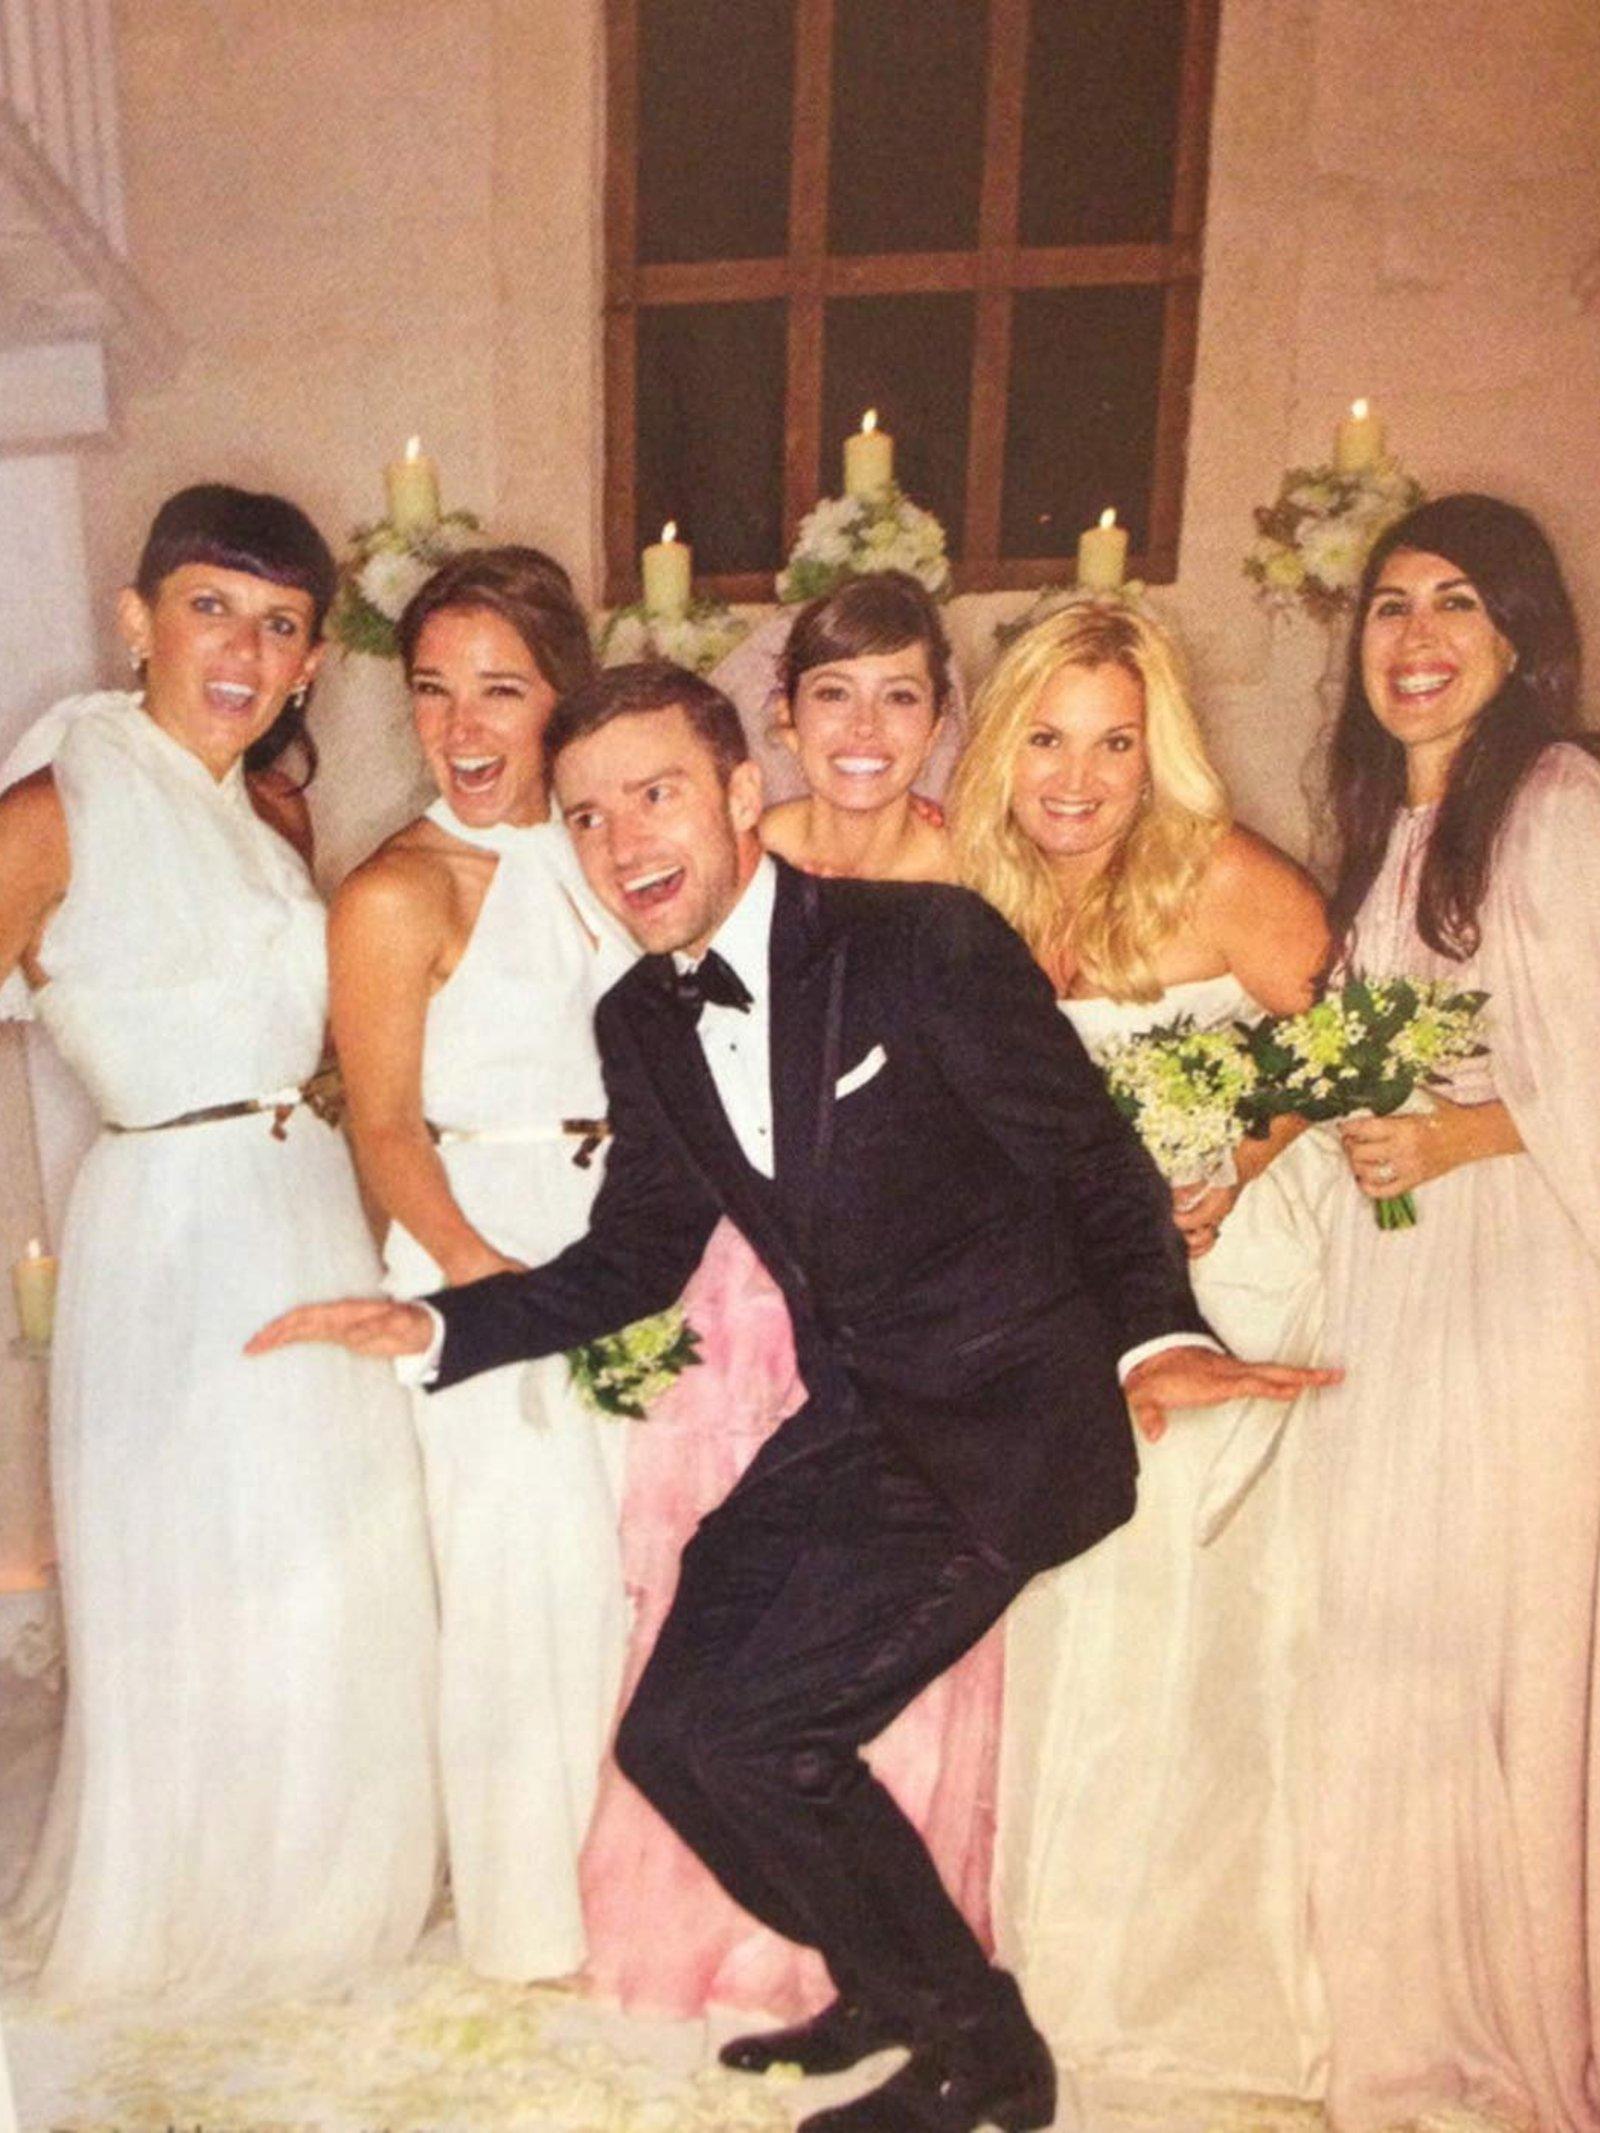 Jessica biel wedding dress pictures